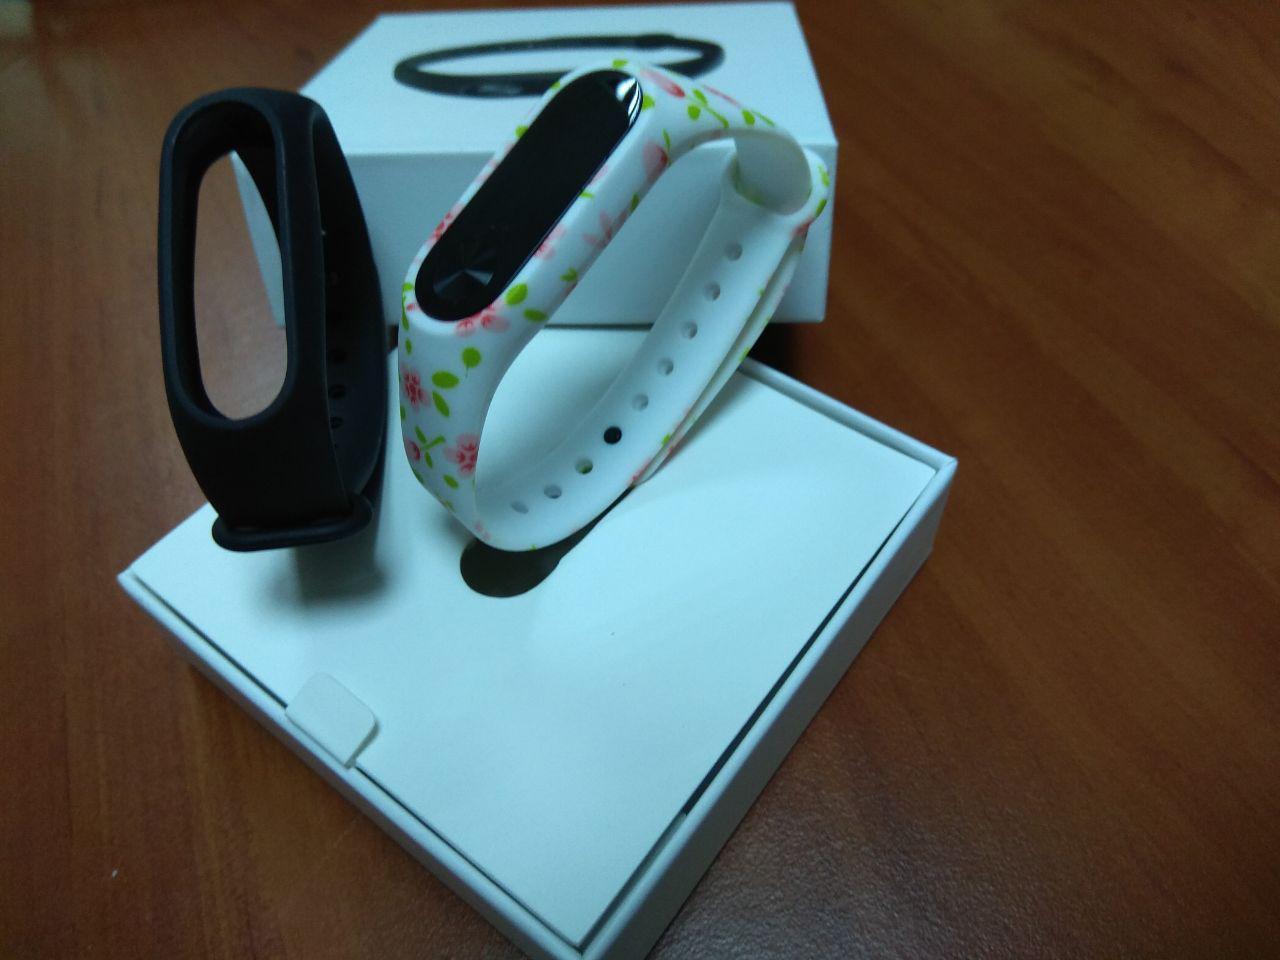 Фитнес-браслет Xiaomi Mi Band 2 (Black) ОРИГИНАЛ + ремешок (White Rose) Гарантия 3 месяца